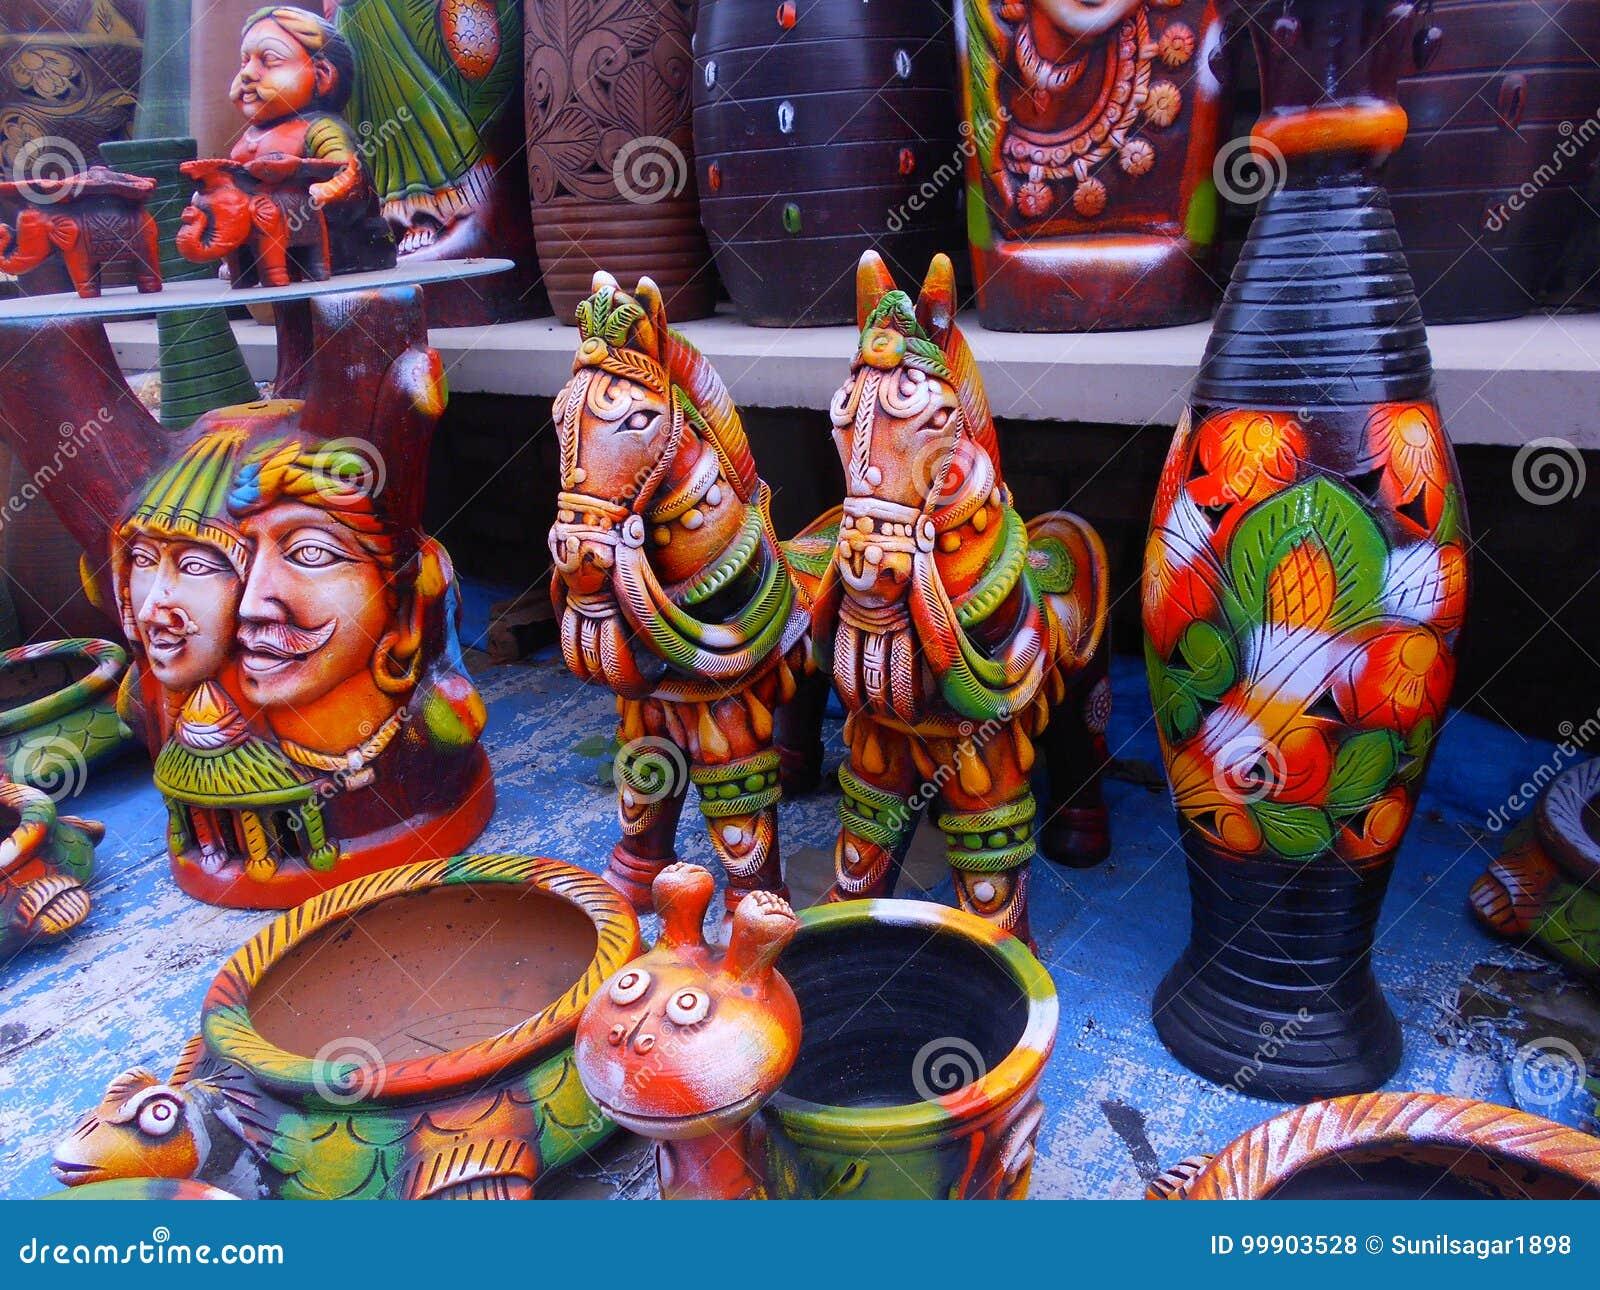 Traditional handicraft.